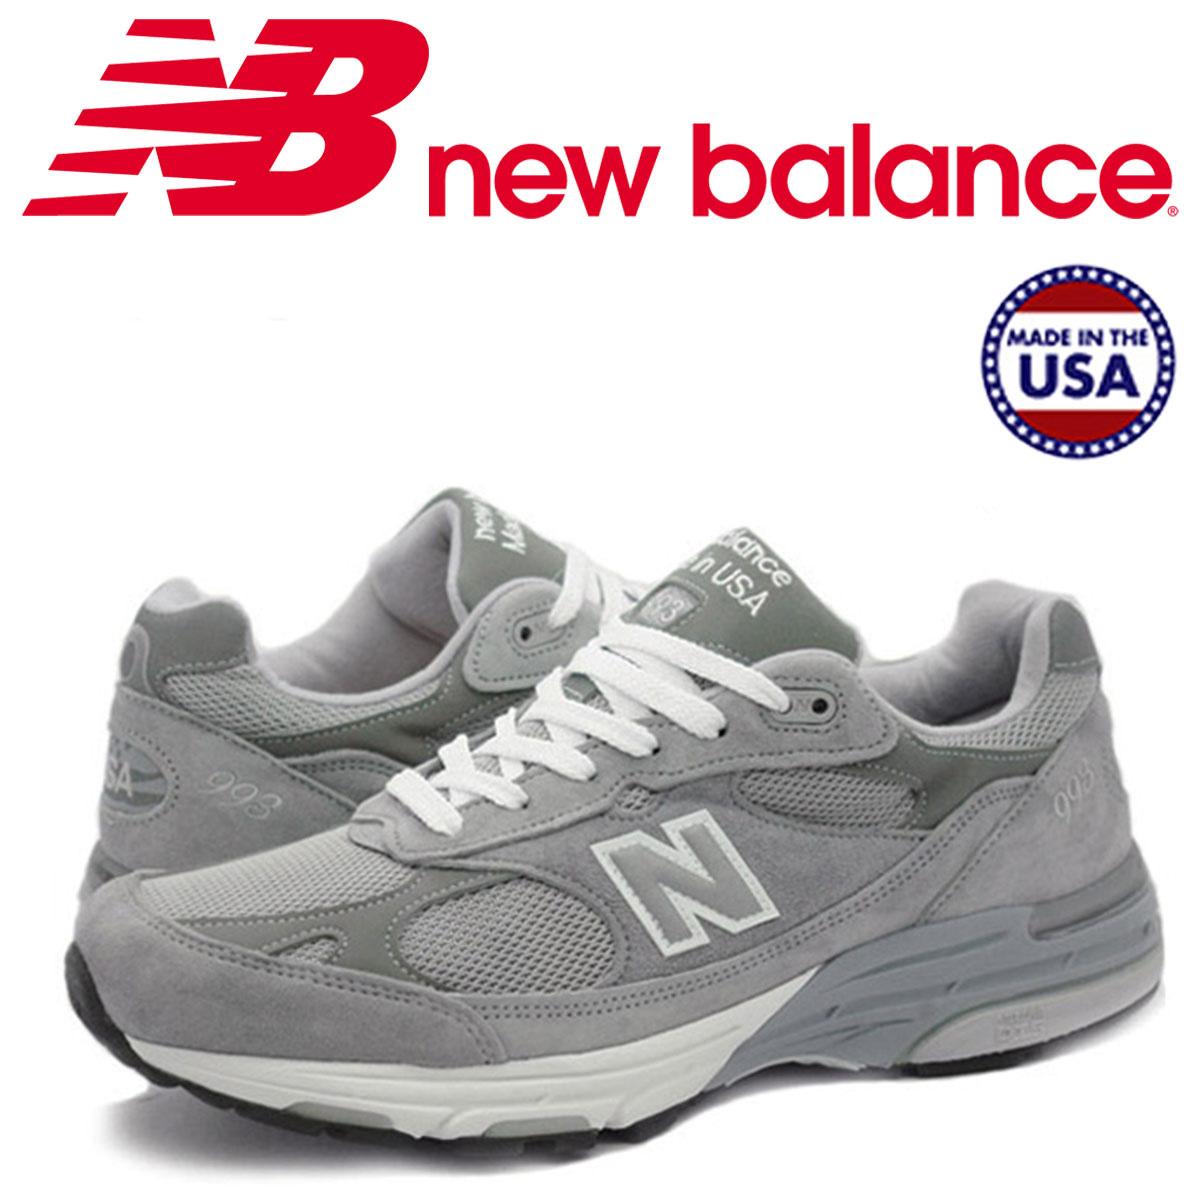 993 new balance